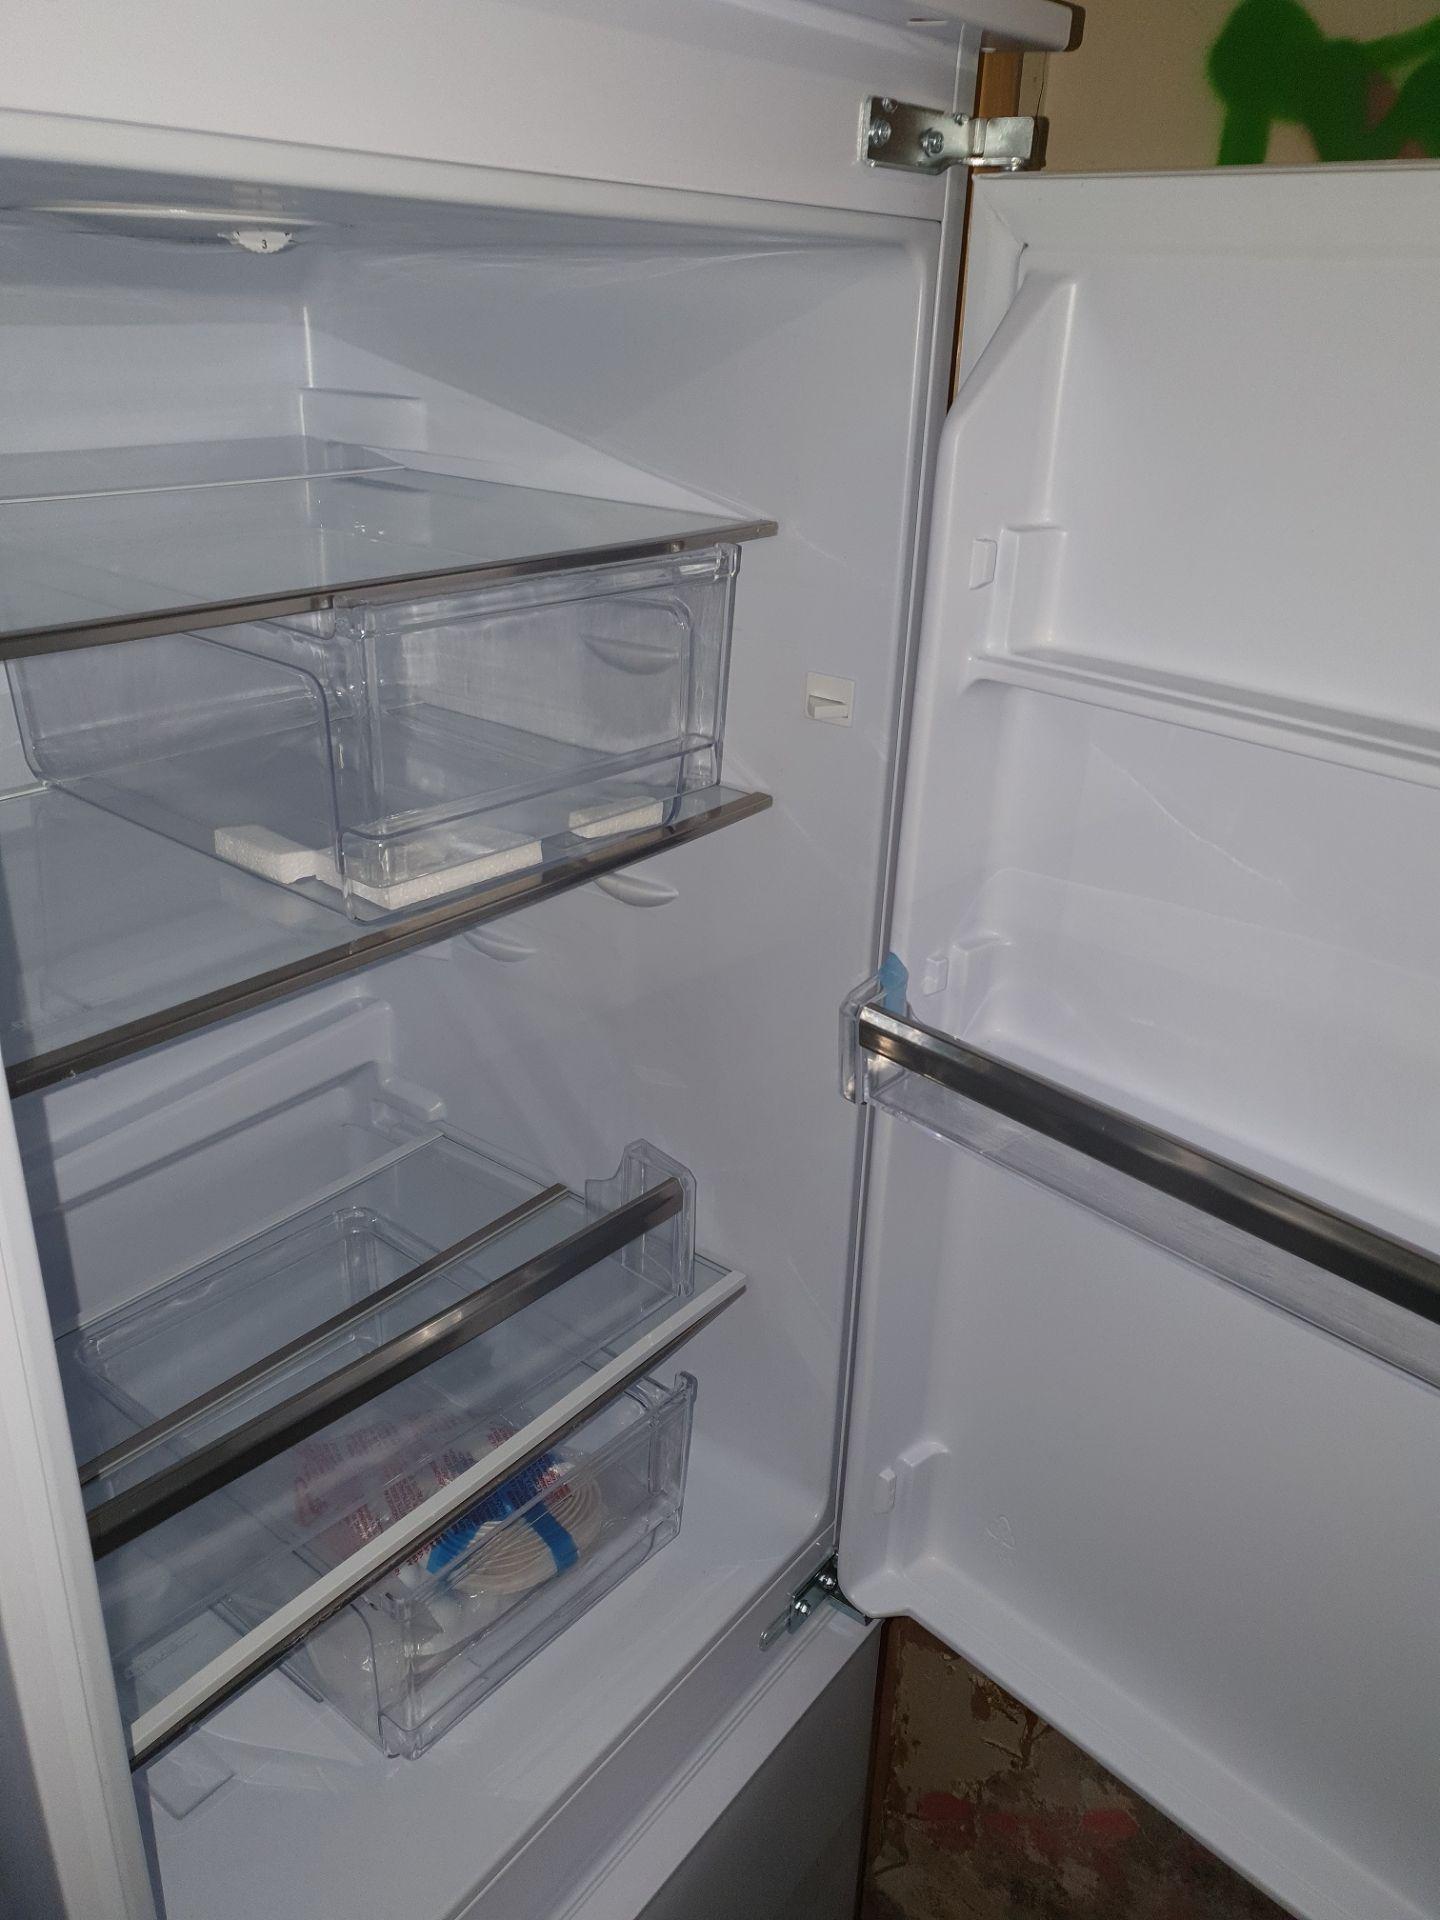 NEW/GRADED AND UNPACKAGED Prima PRRF702 Integrated Fridge Freezer (Brand new slight external - Image 13 of 14